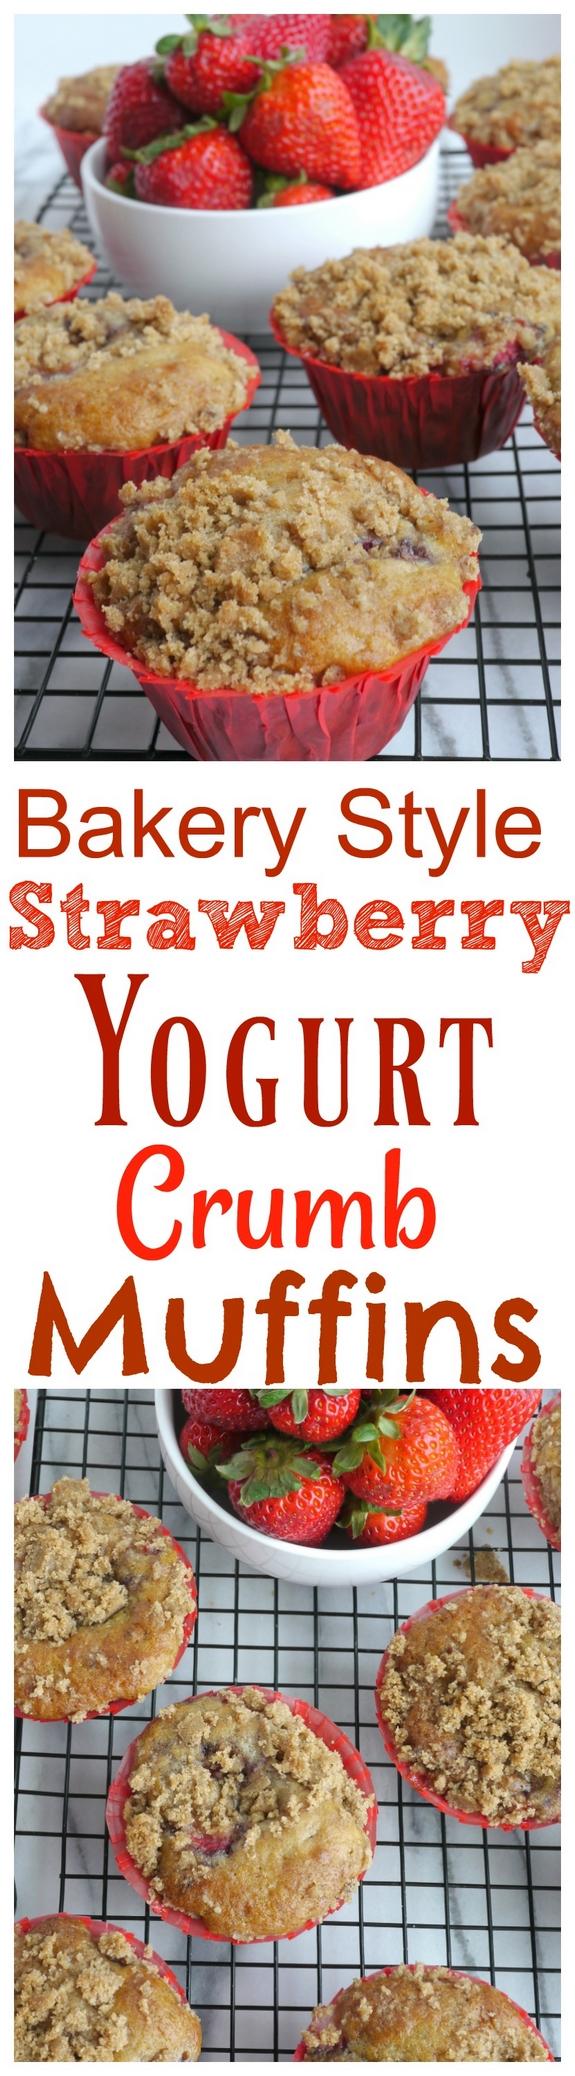 Bakery Style Strawberry Yogurt Crumb Muffins